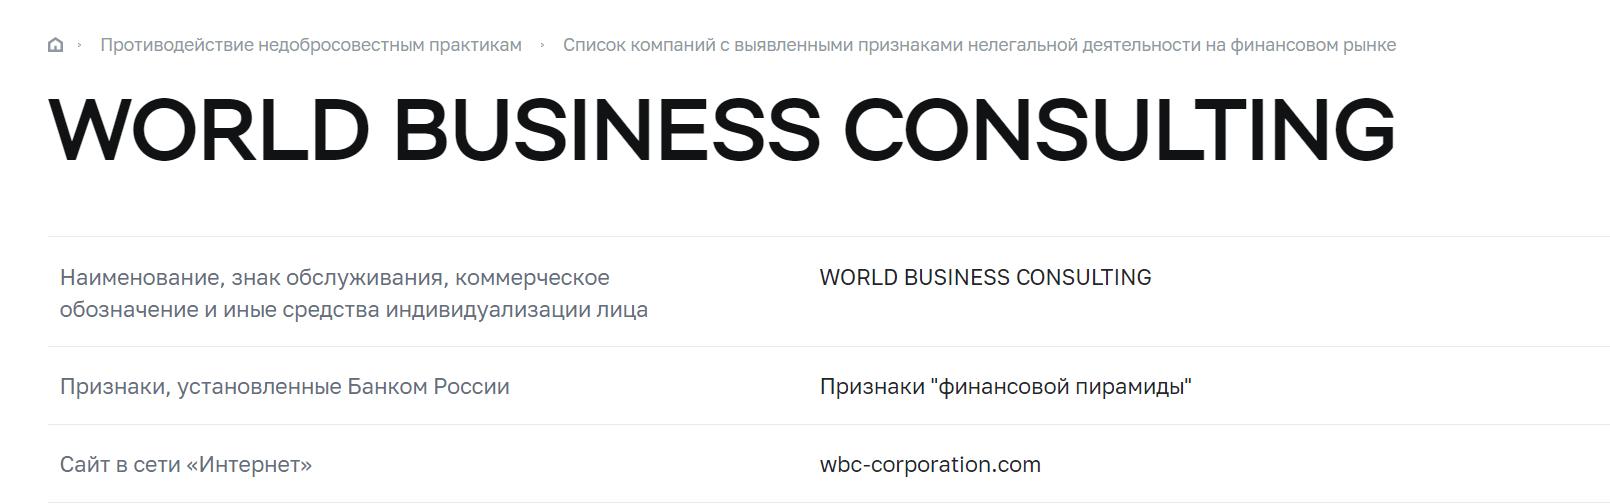 WBC-Corporation - МЛМ-лохотрон, Фото № 8 - 1-consult.net